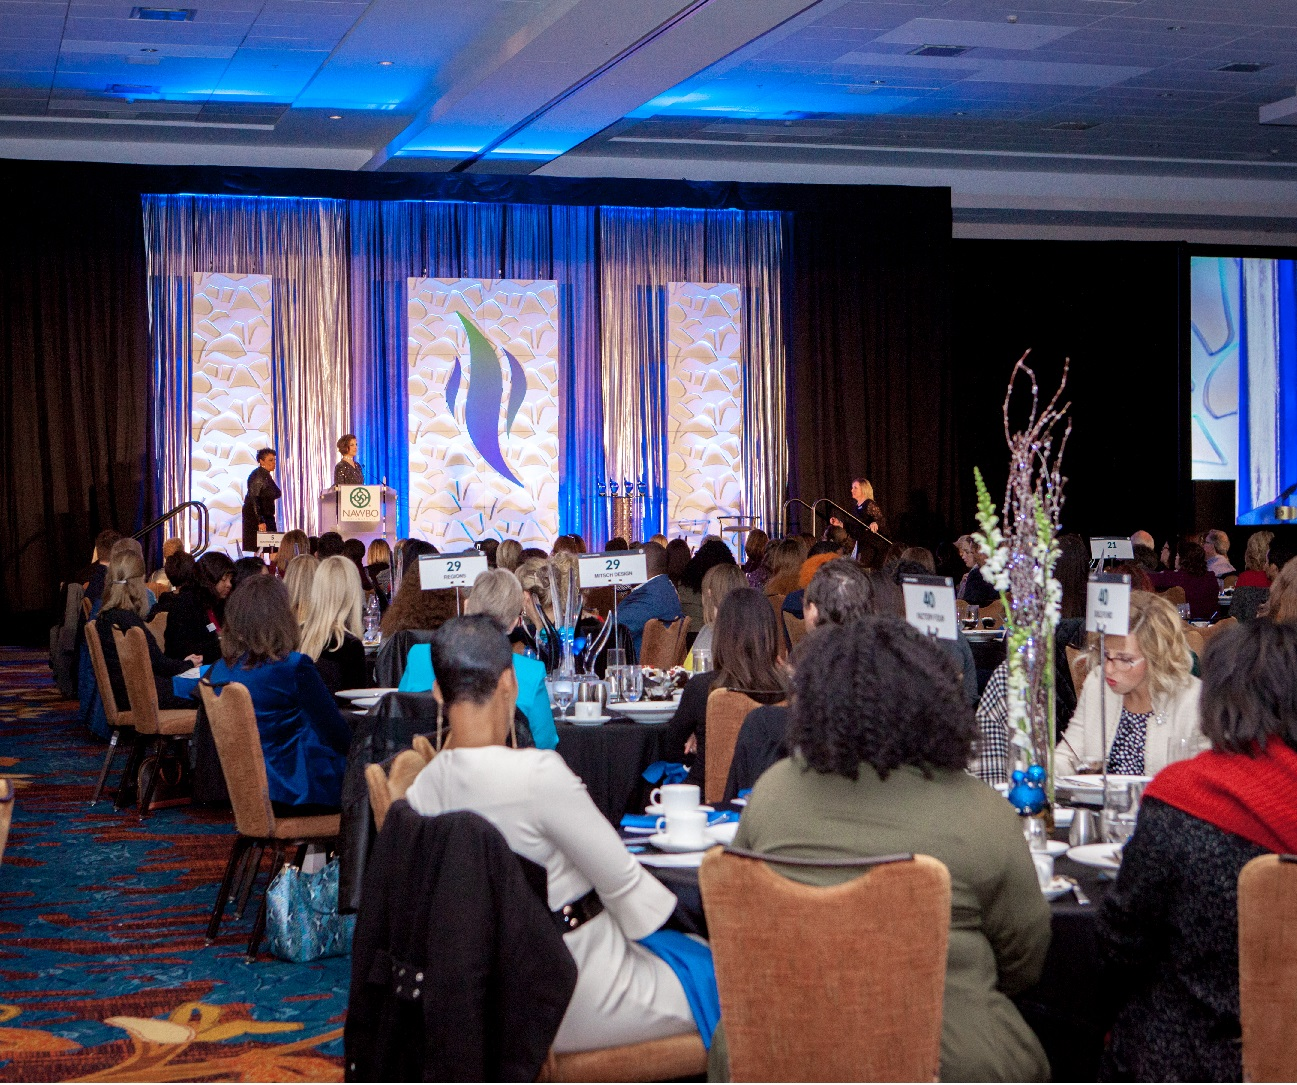 NAWBO-Indianapolis Visionary Awards Luncheon 2018